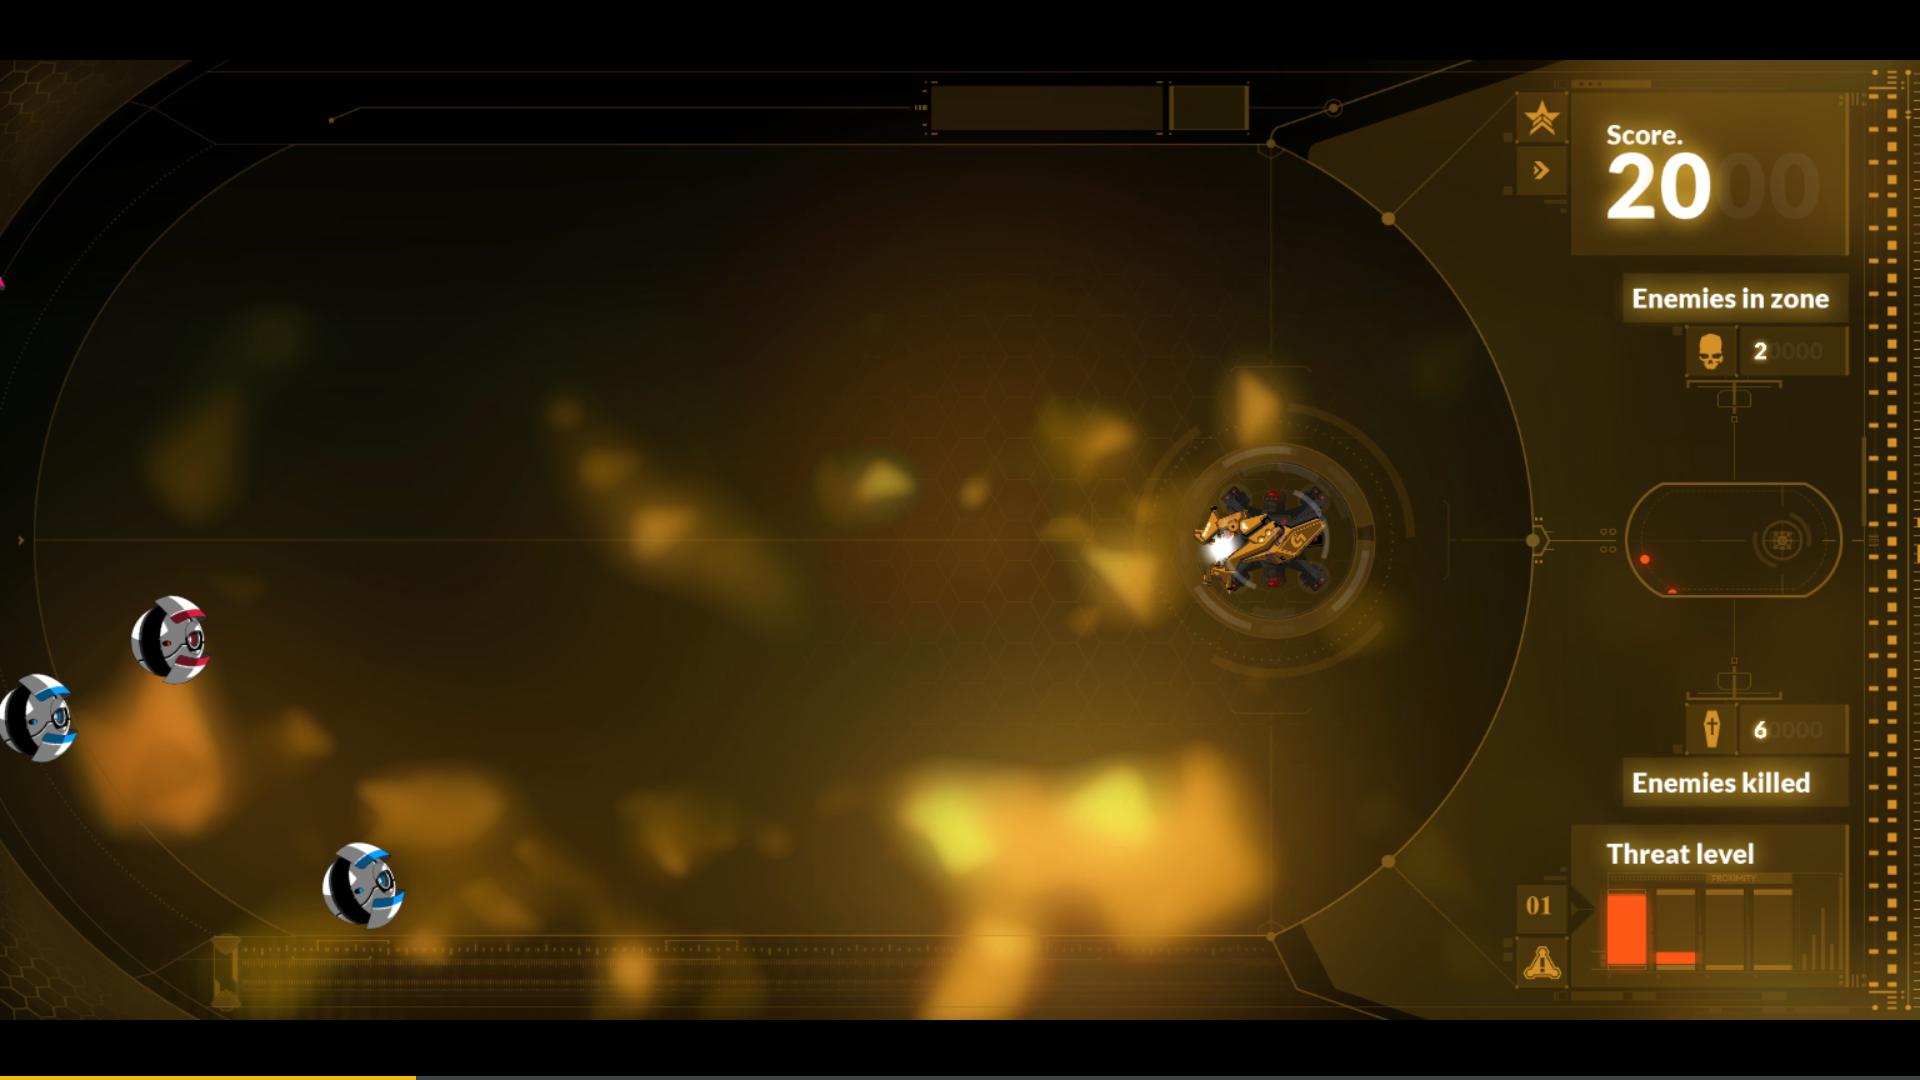 CodingGame starship loop shooting game